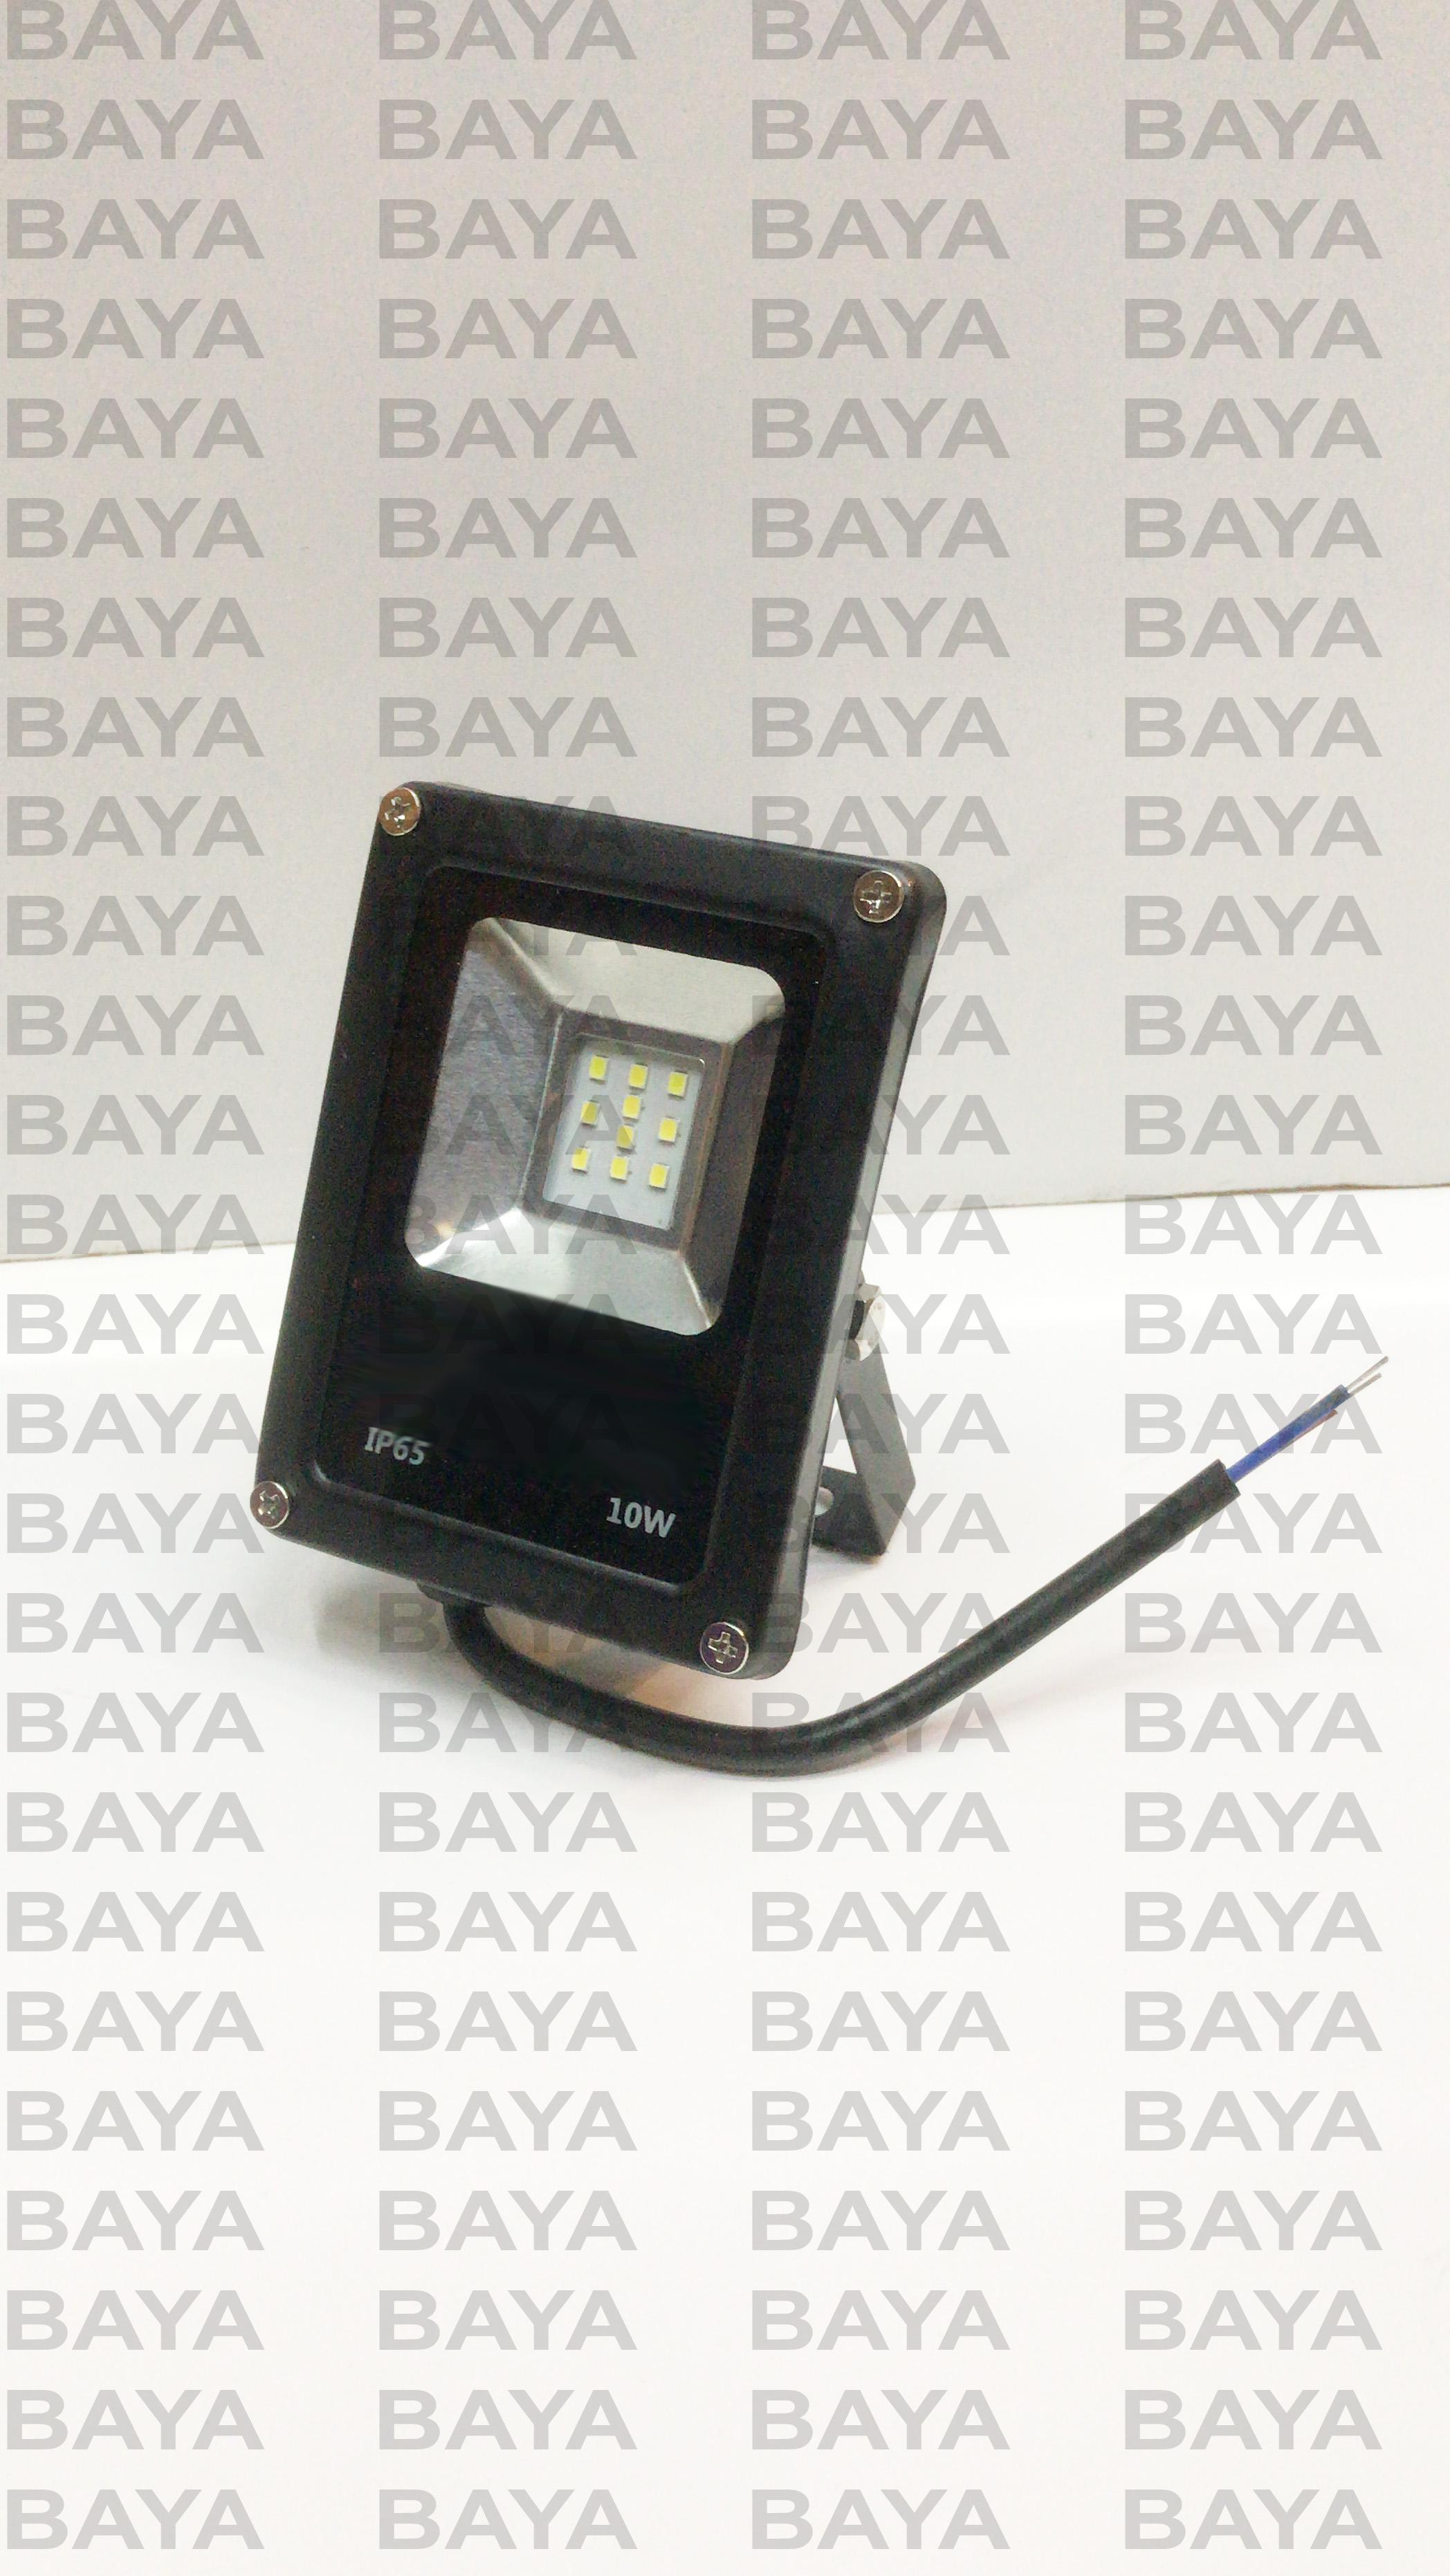 lampu led sorot 10W 10 watt / tembak / panggung / outdoor / taman / lapangan